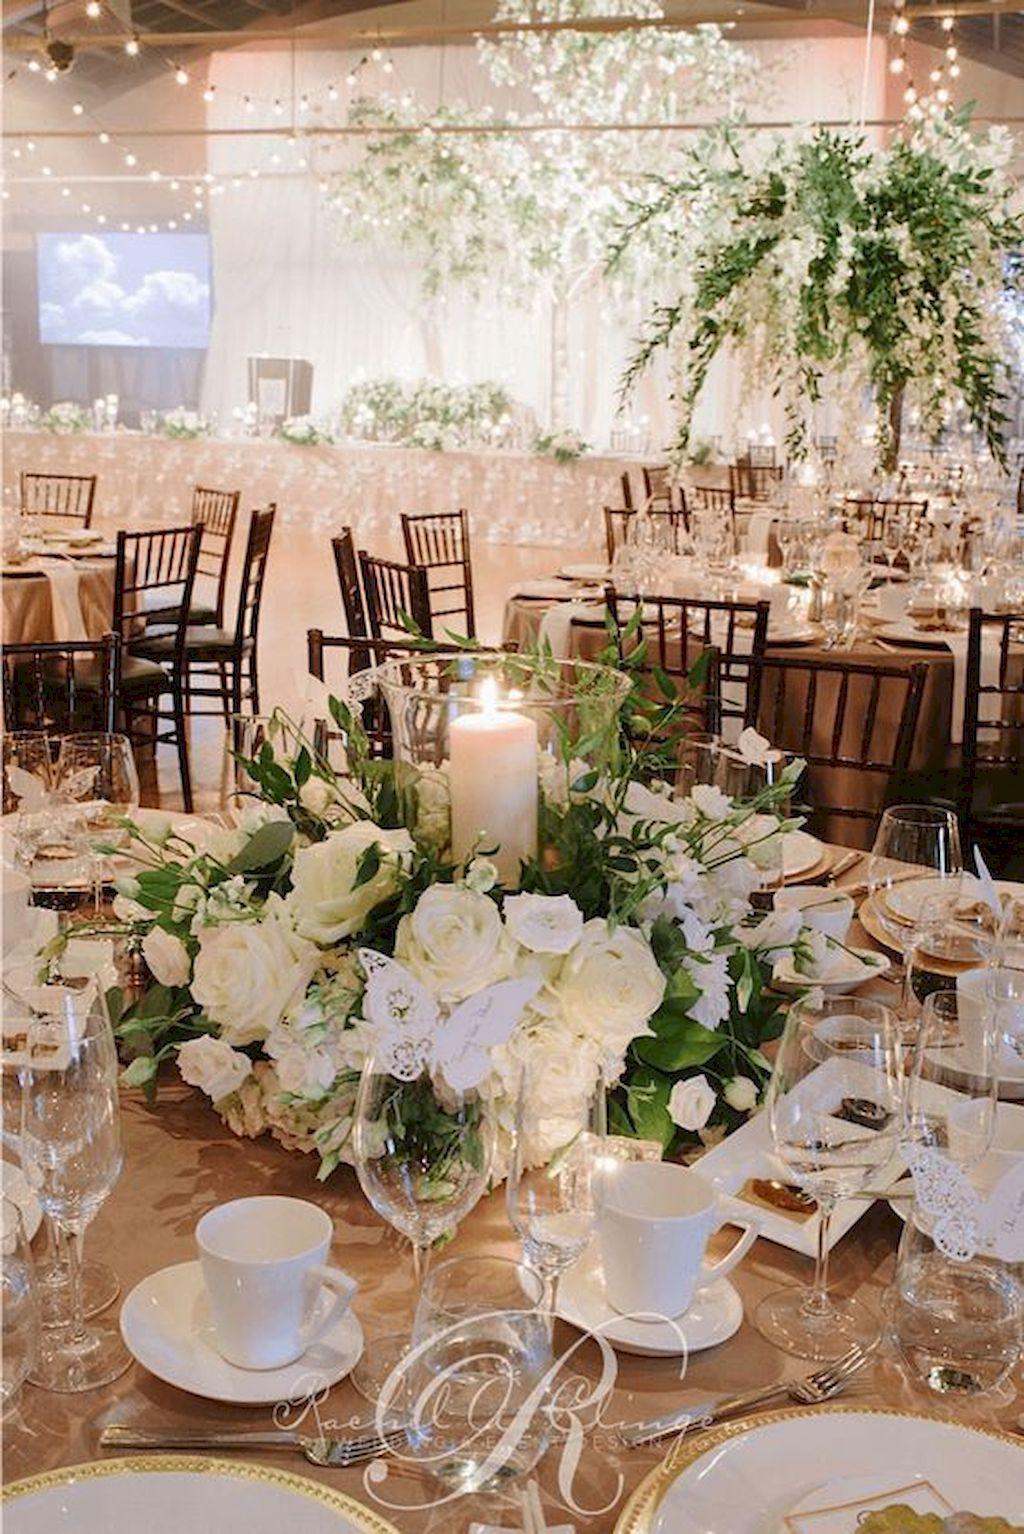 Simple greenery wedding centerpieces ideas 7 wedding centerpieces luxury green and white ballroom wedding reception decor via rachel a junglespirit Gallery